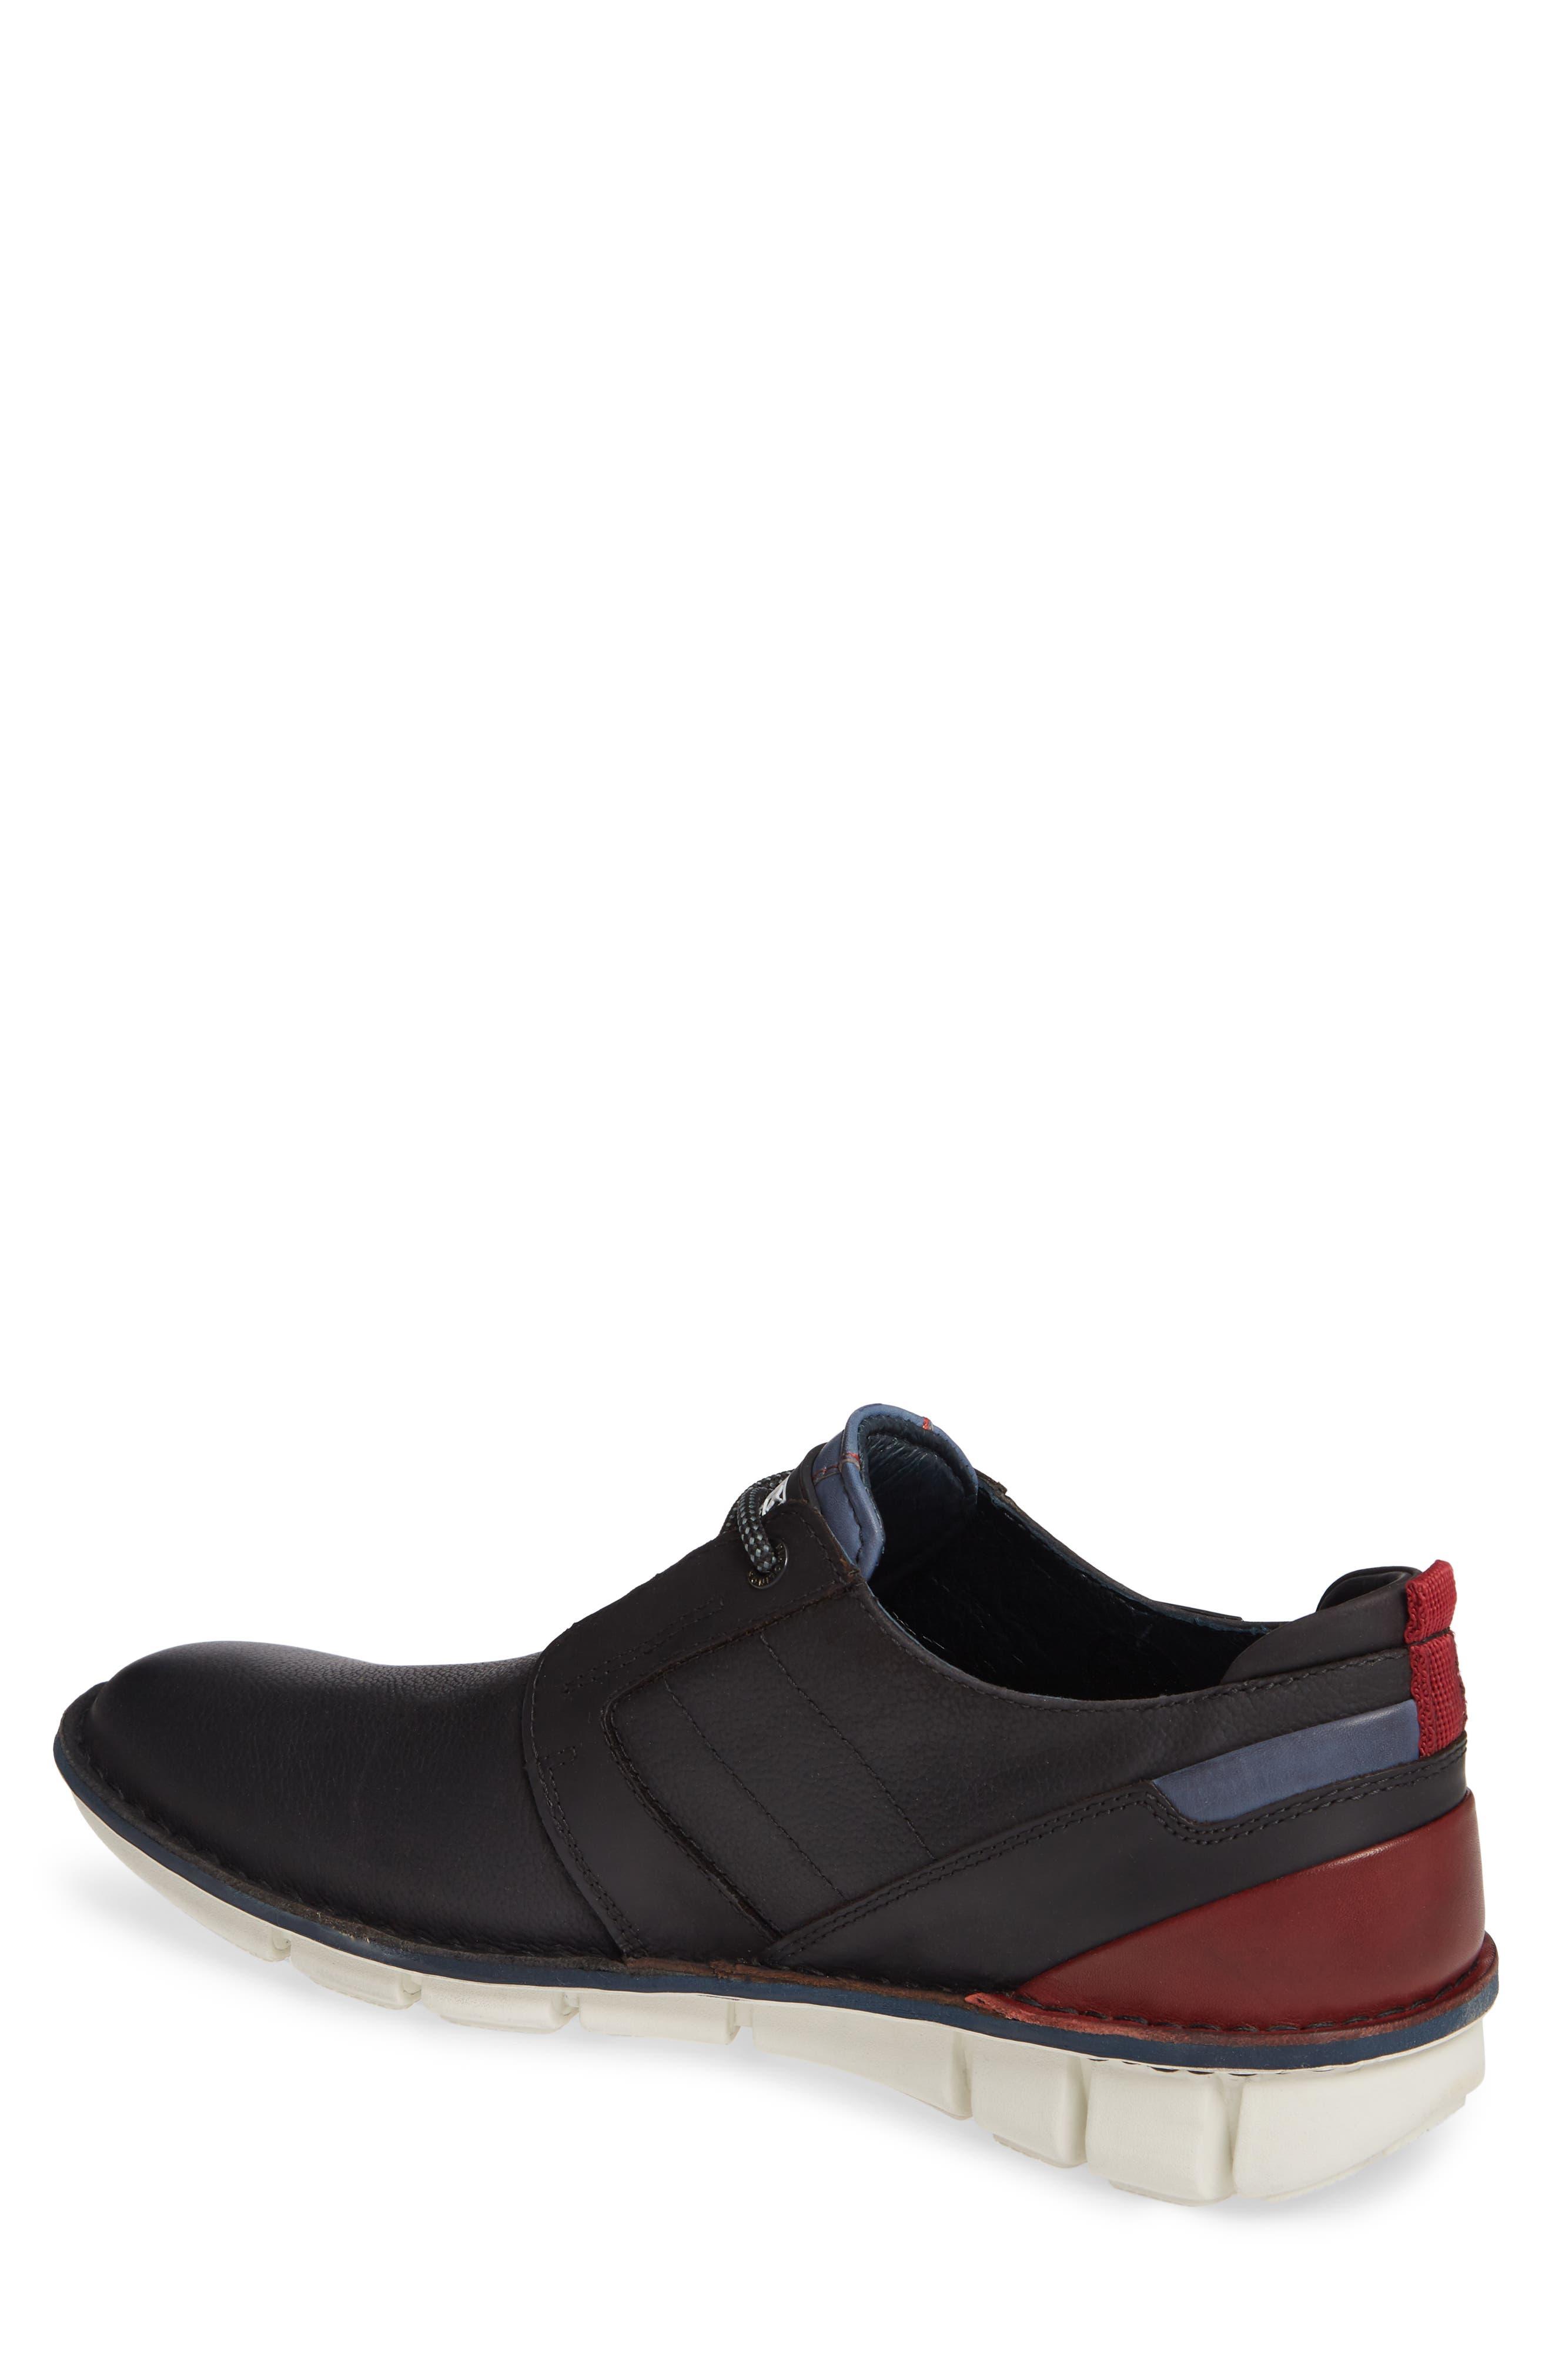 Tudela Plain Toe Derby,                             Alternate thumbnail 2, color,                             BLACK BLACK